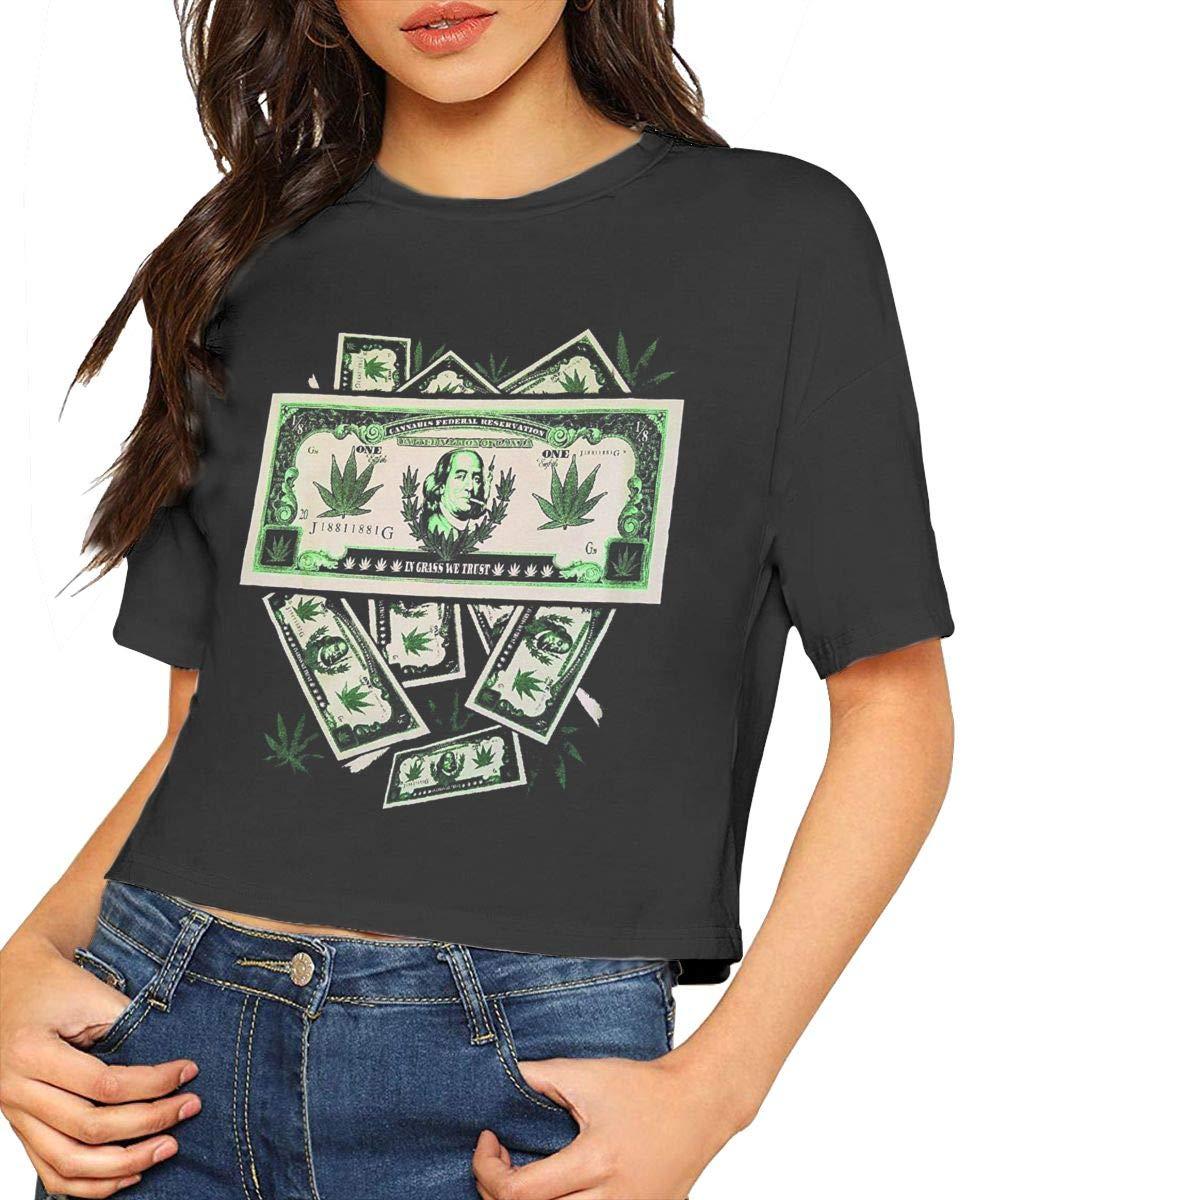 Lizdxtas Money In Grass We Trust Sexy Navel,fashion Classic T Shirt